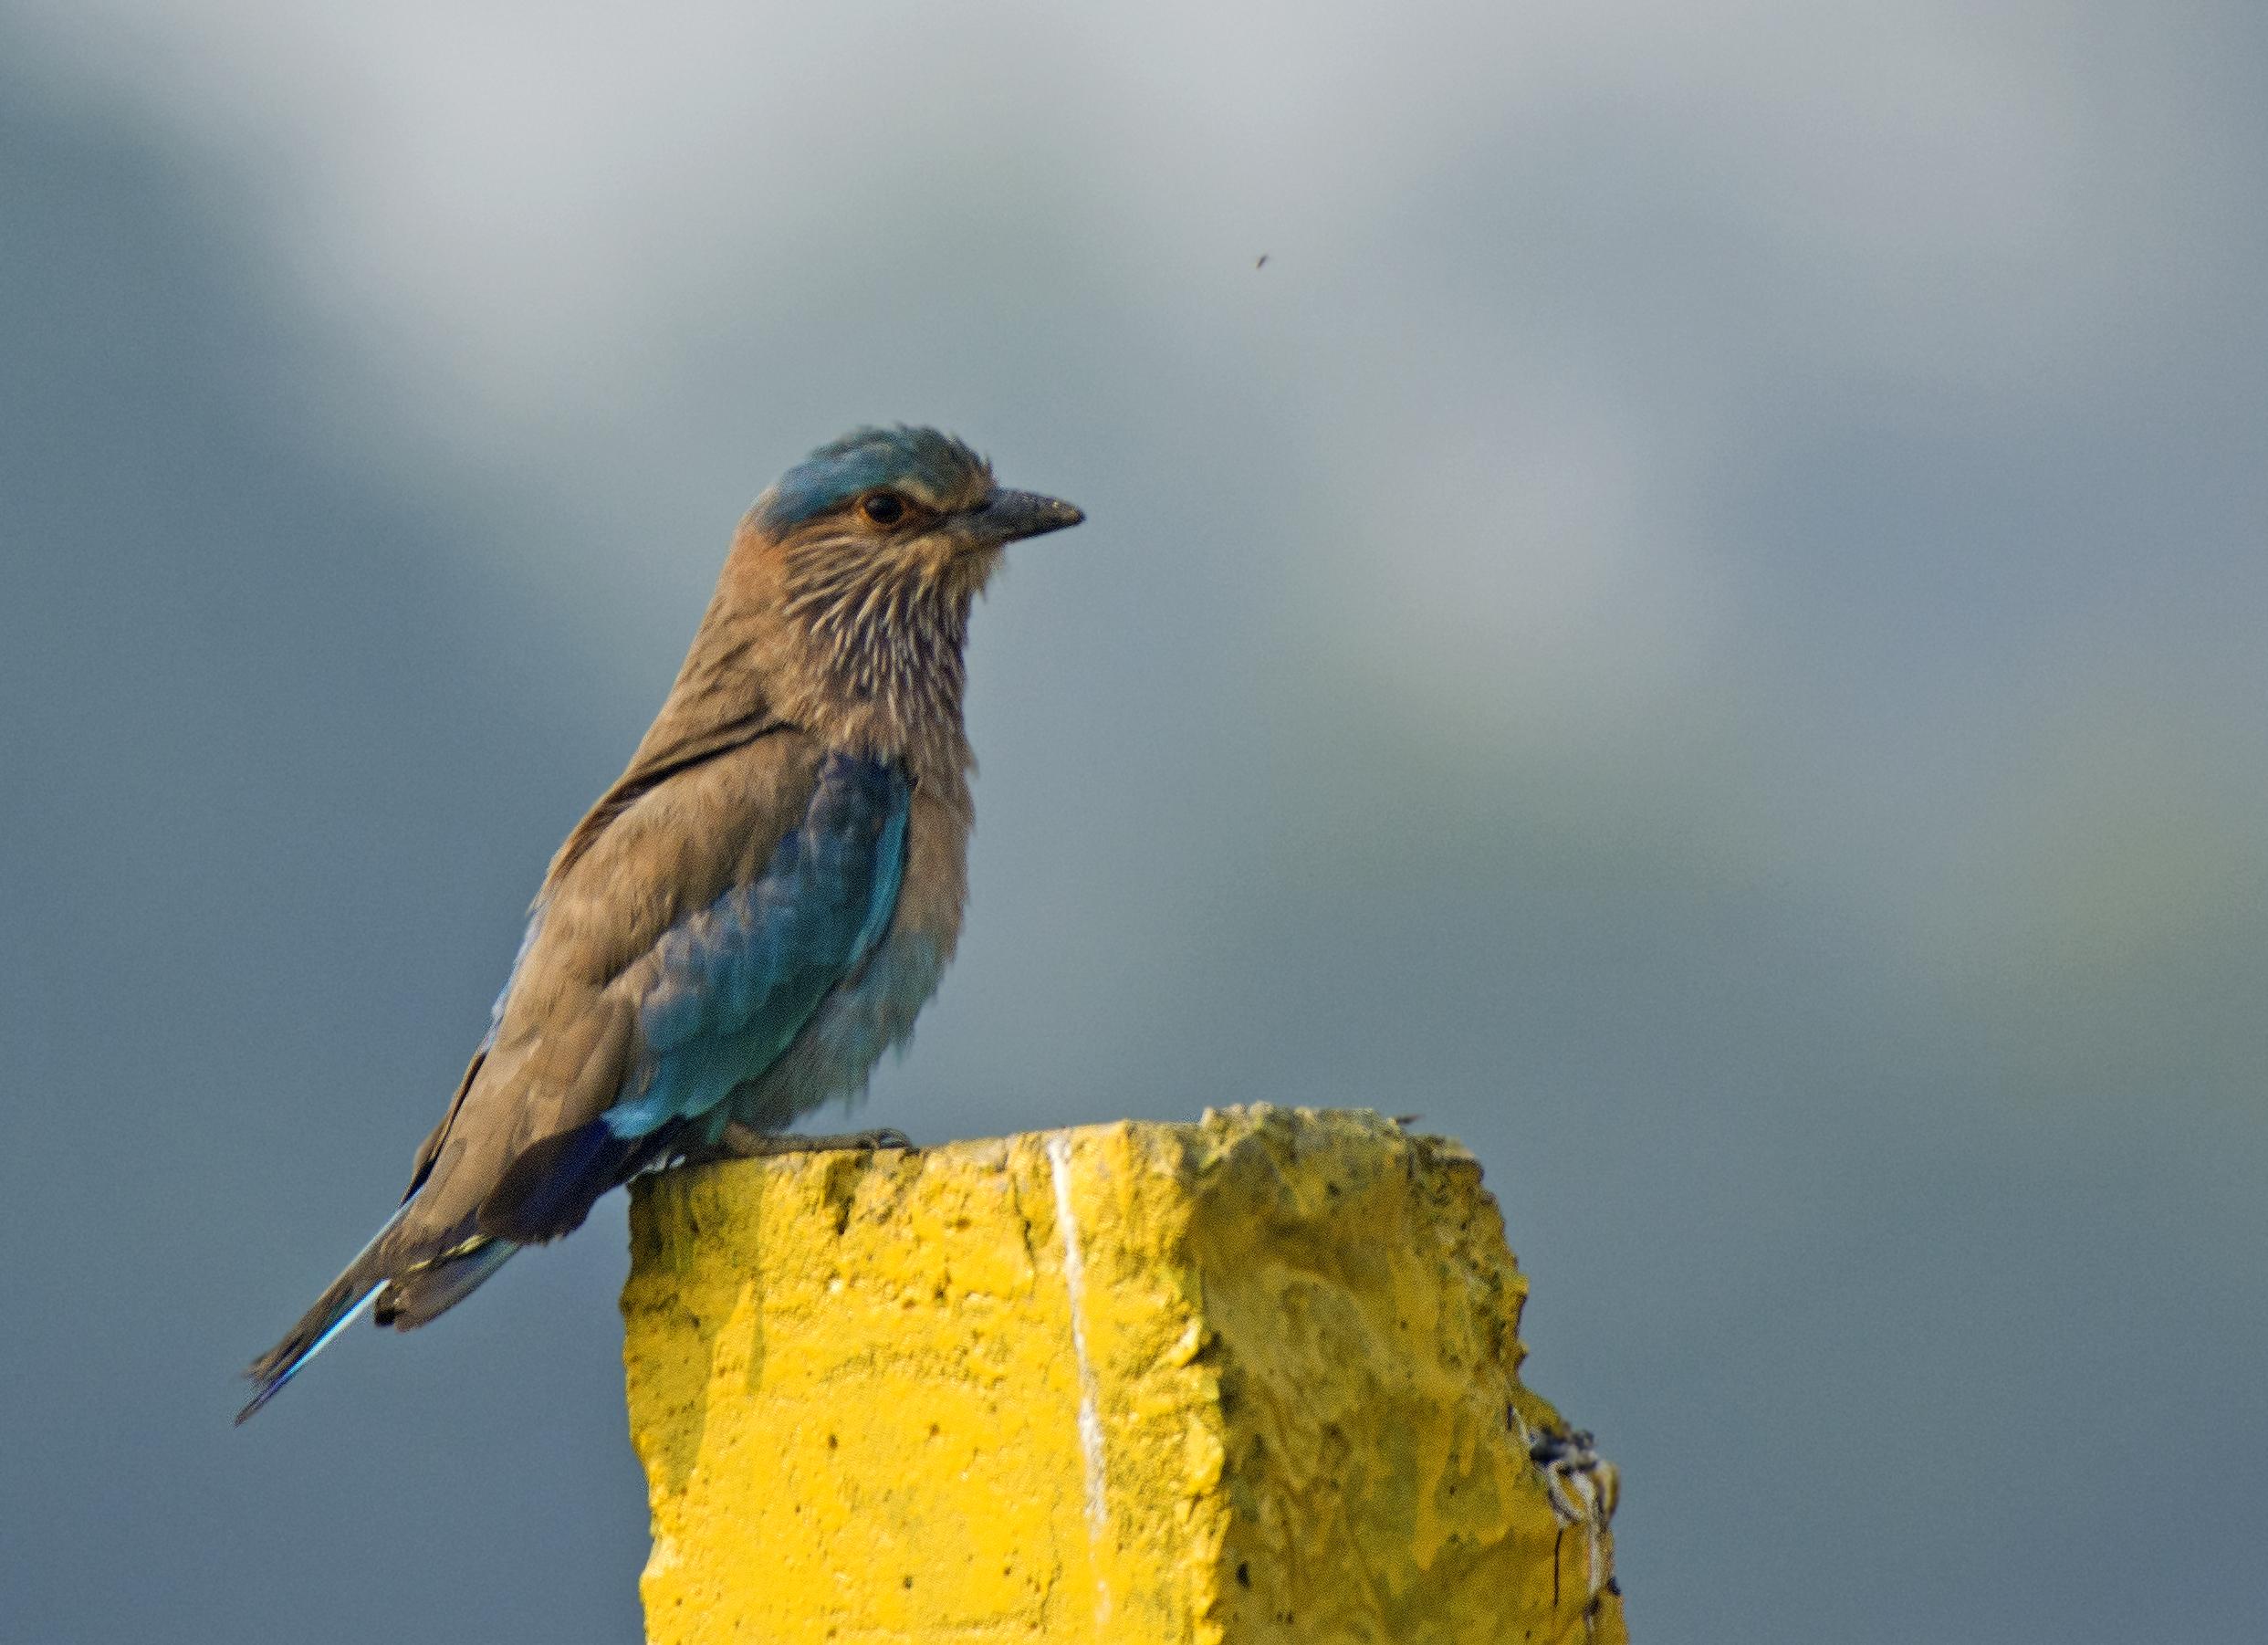 Sitting Bird